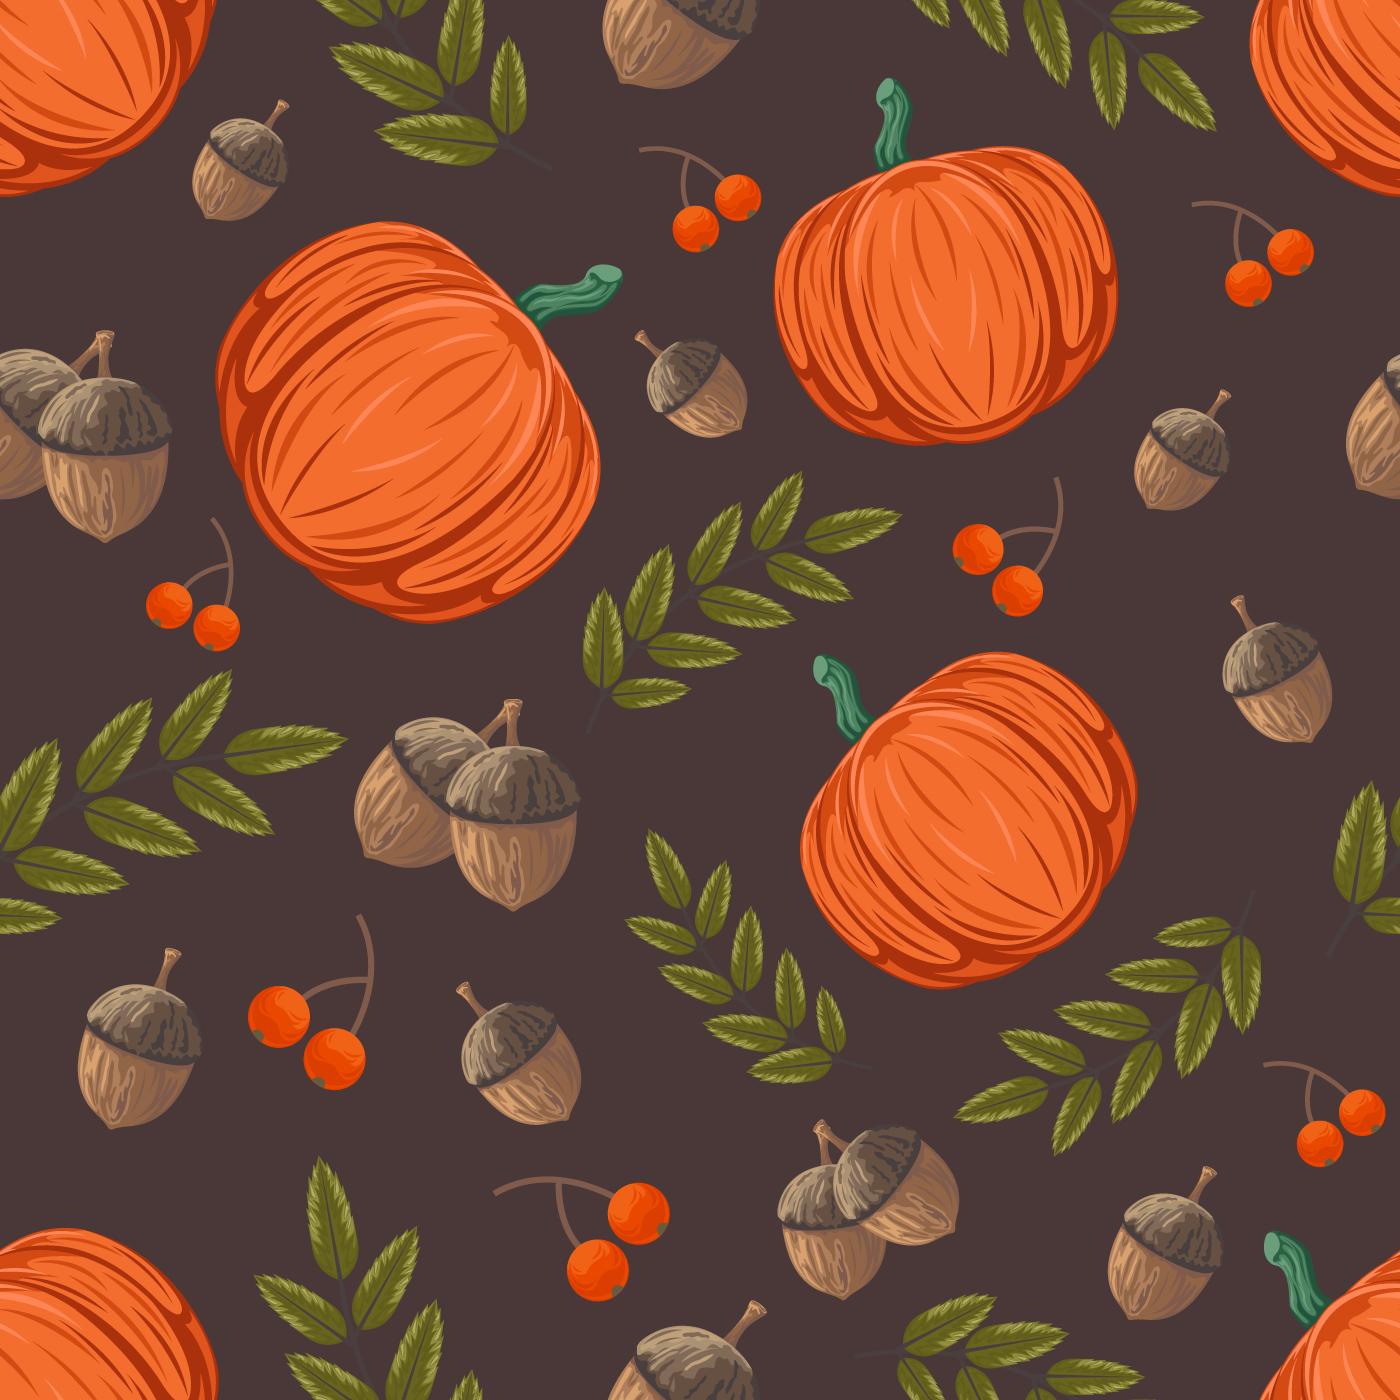 Fall Sunflower Wallpaper Fall Pattern Download Free Vector Art Stock Graphics